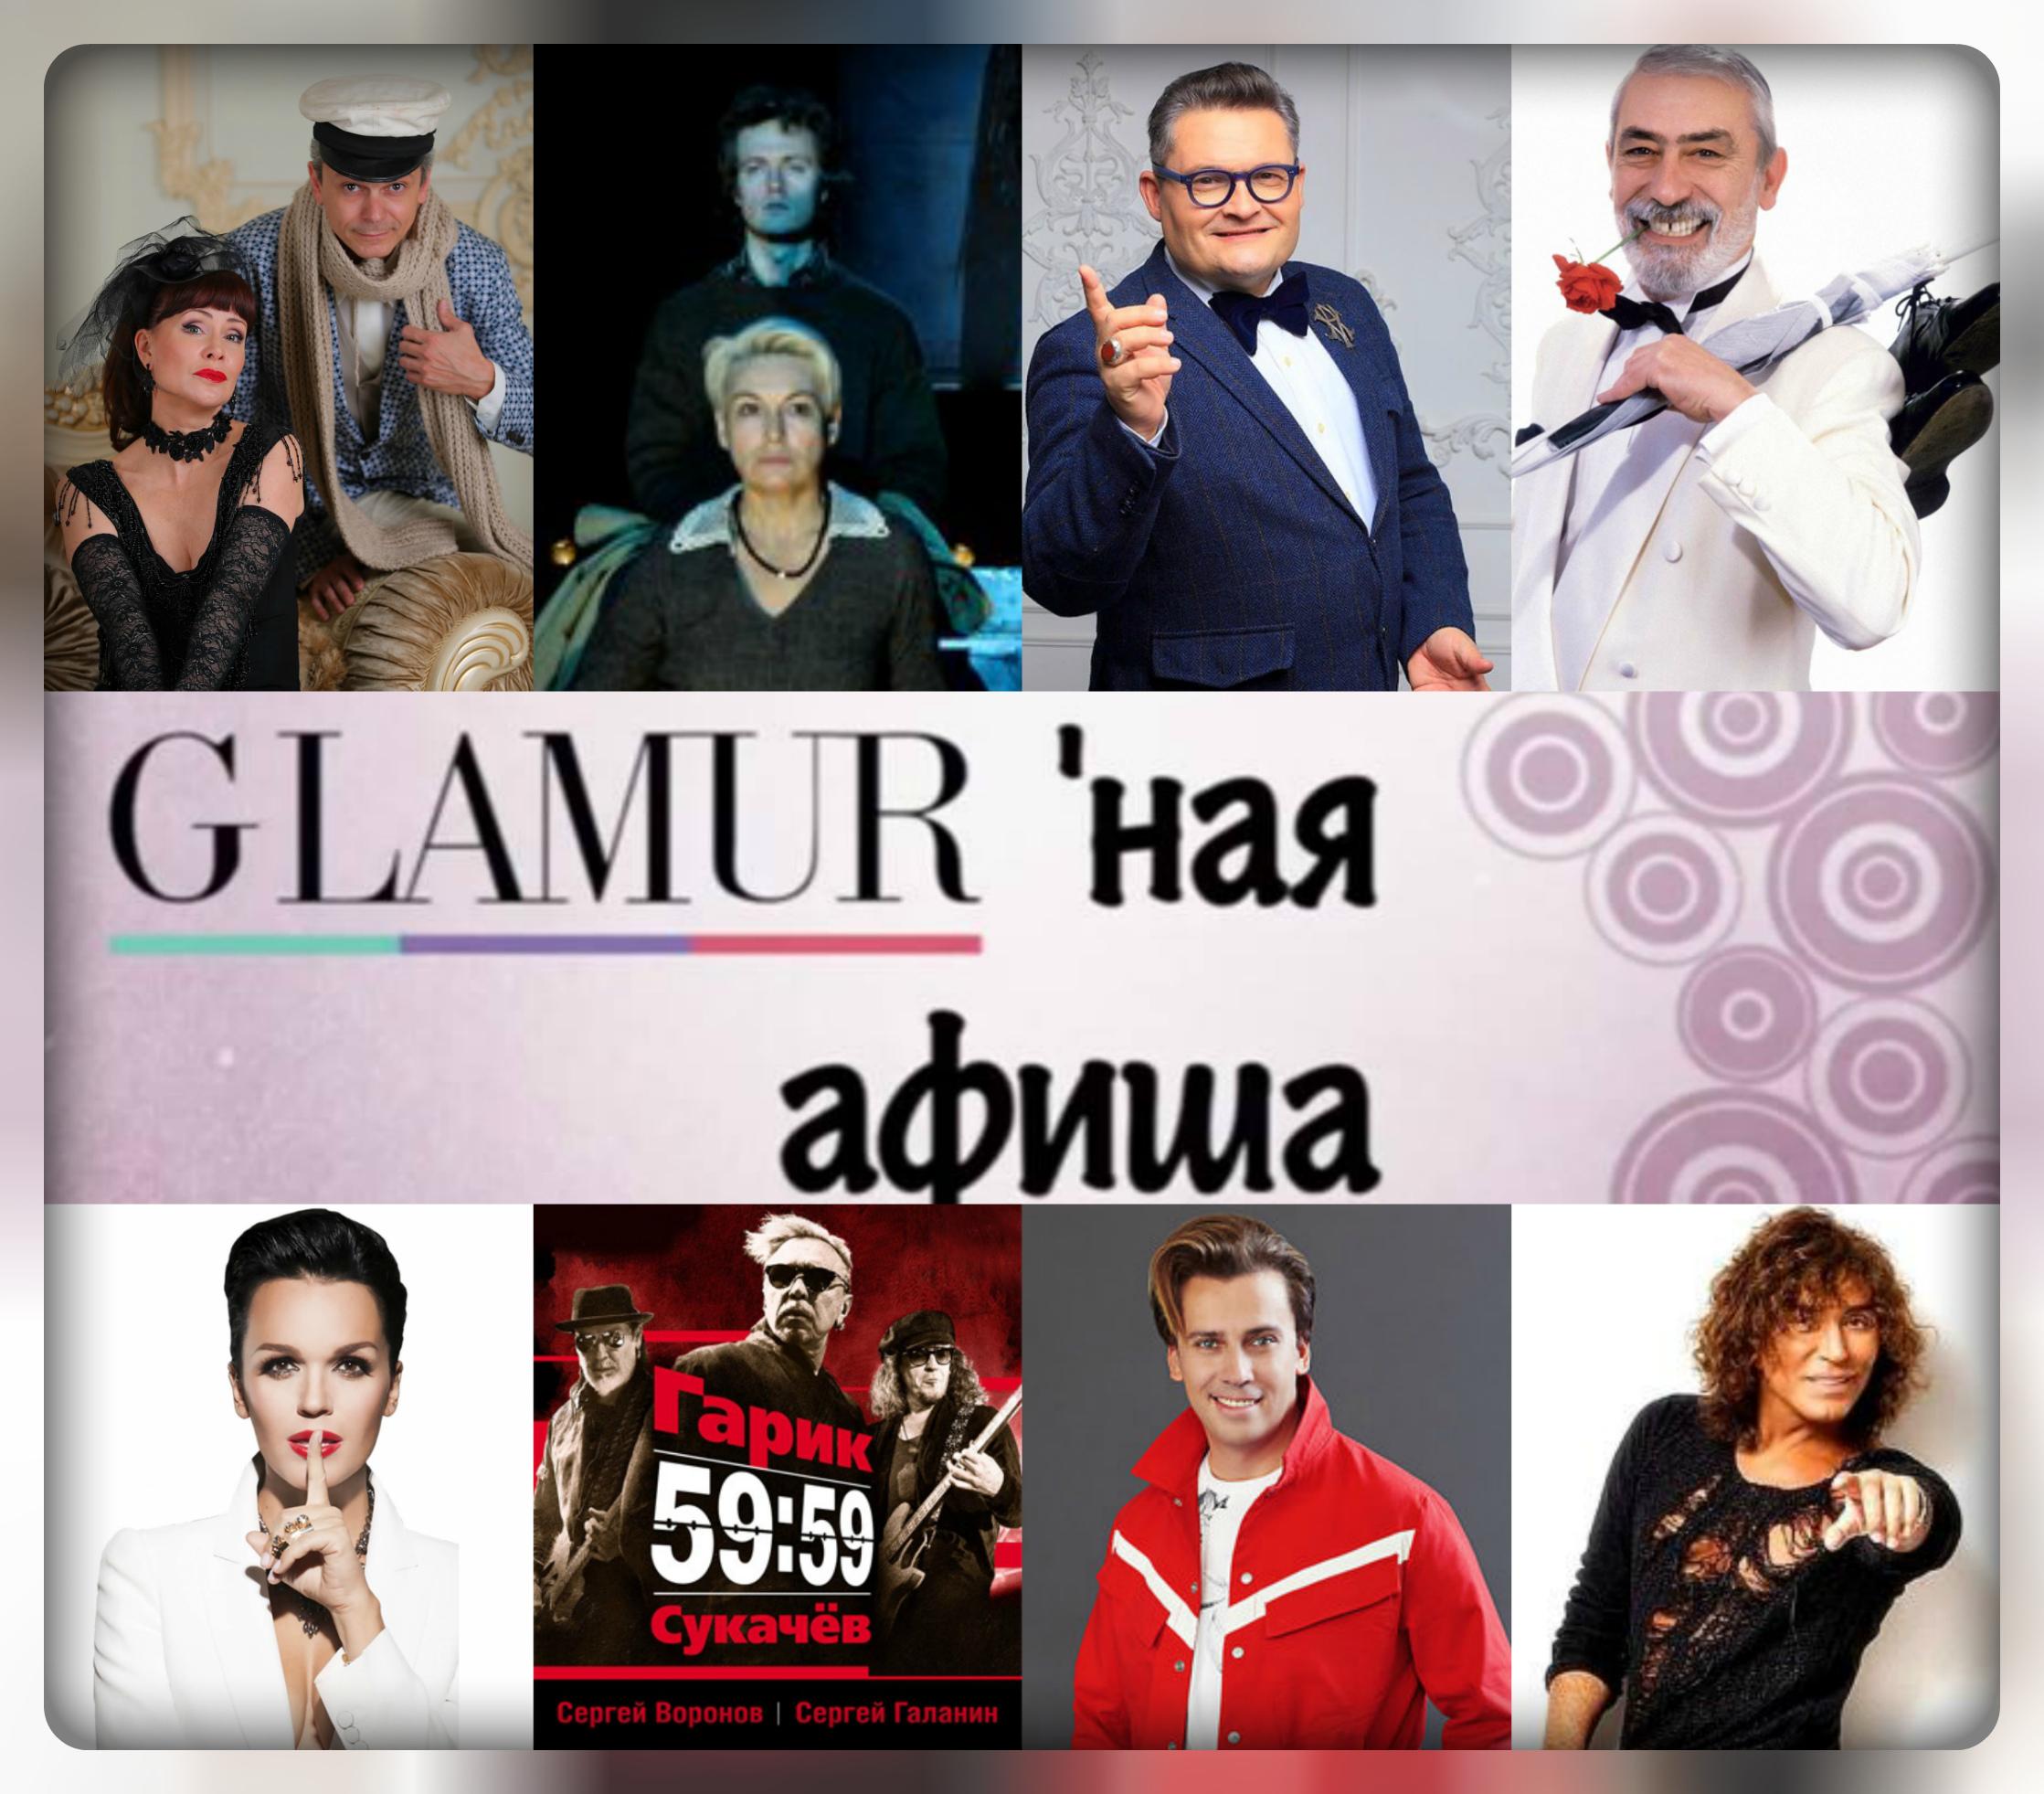 Первая афиша 2019 года от редакции журнала «Glamur»